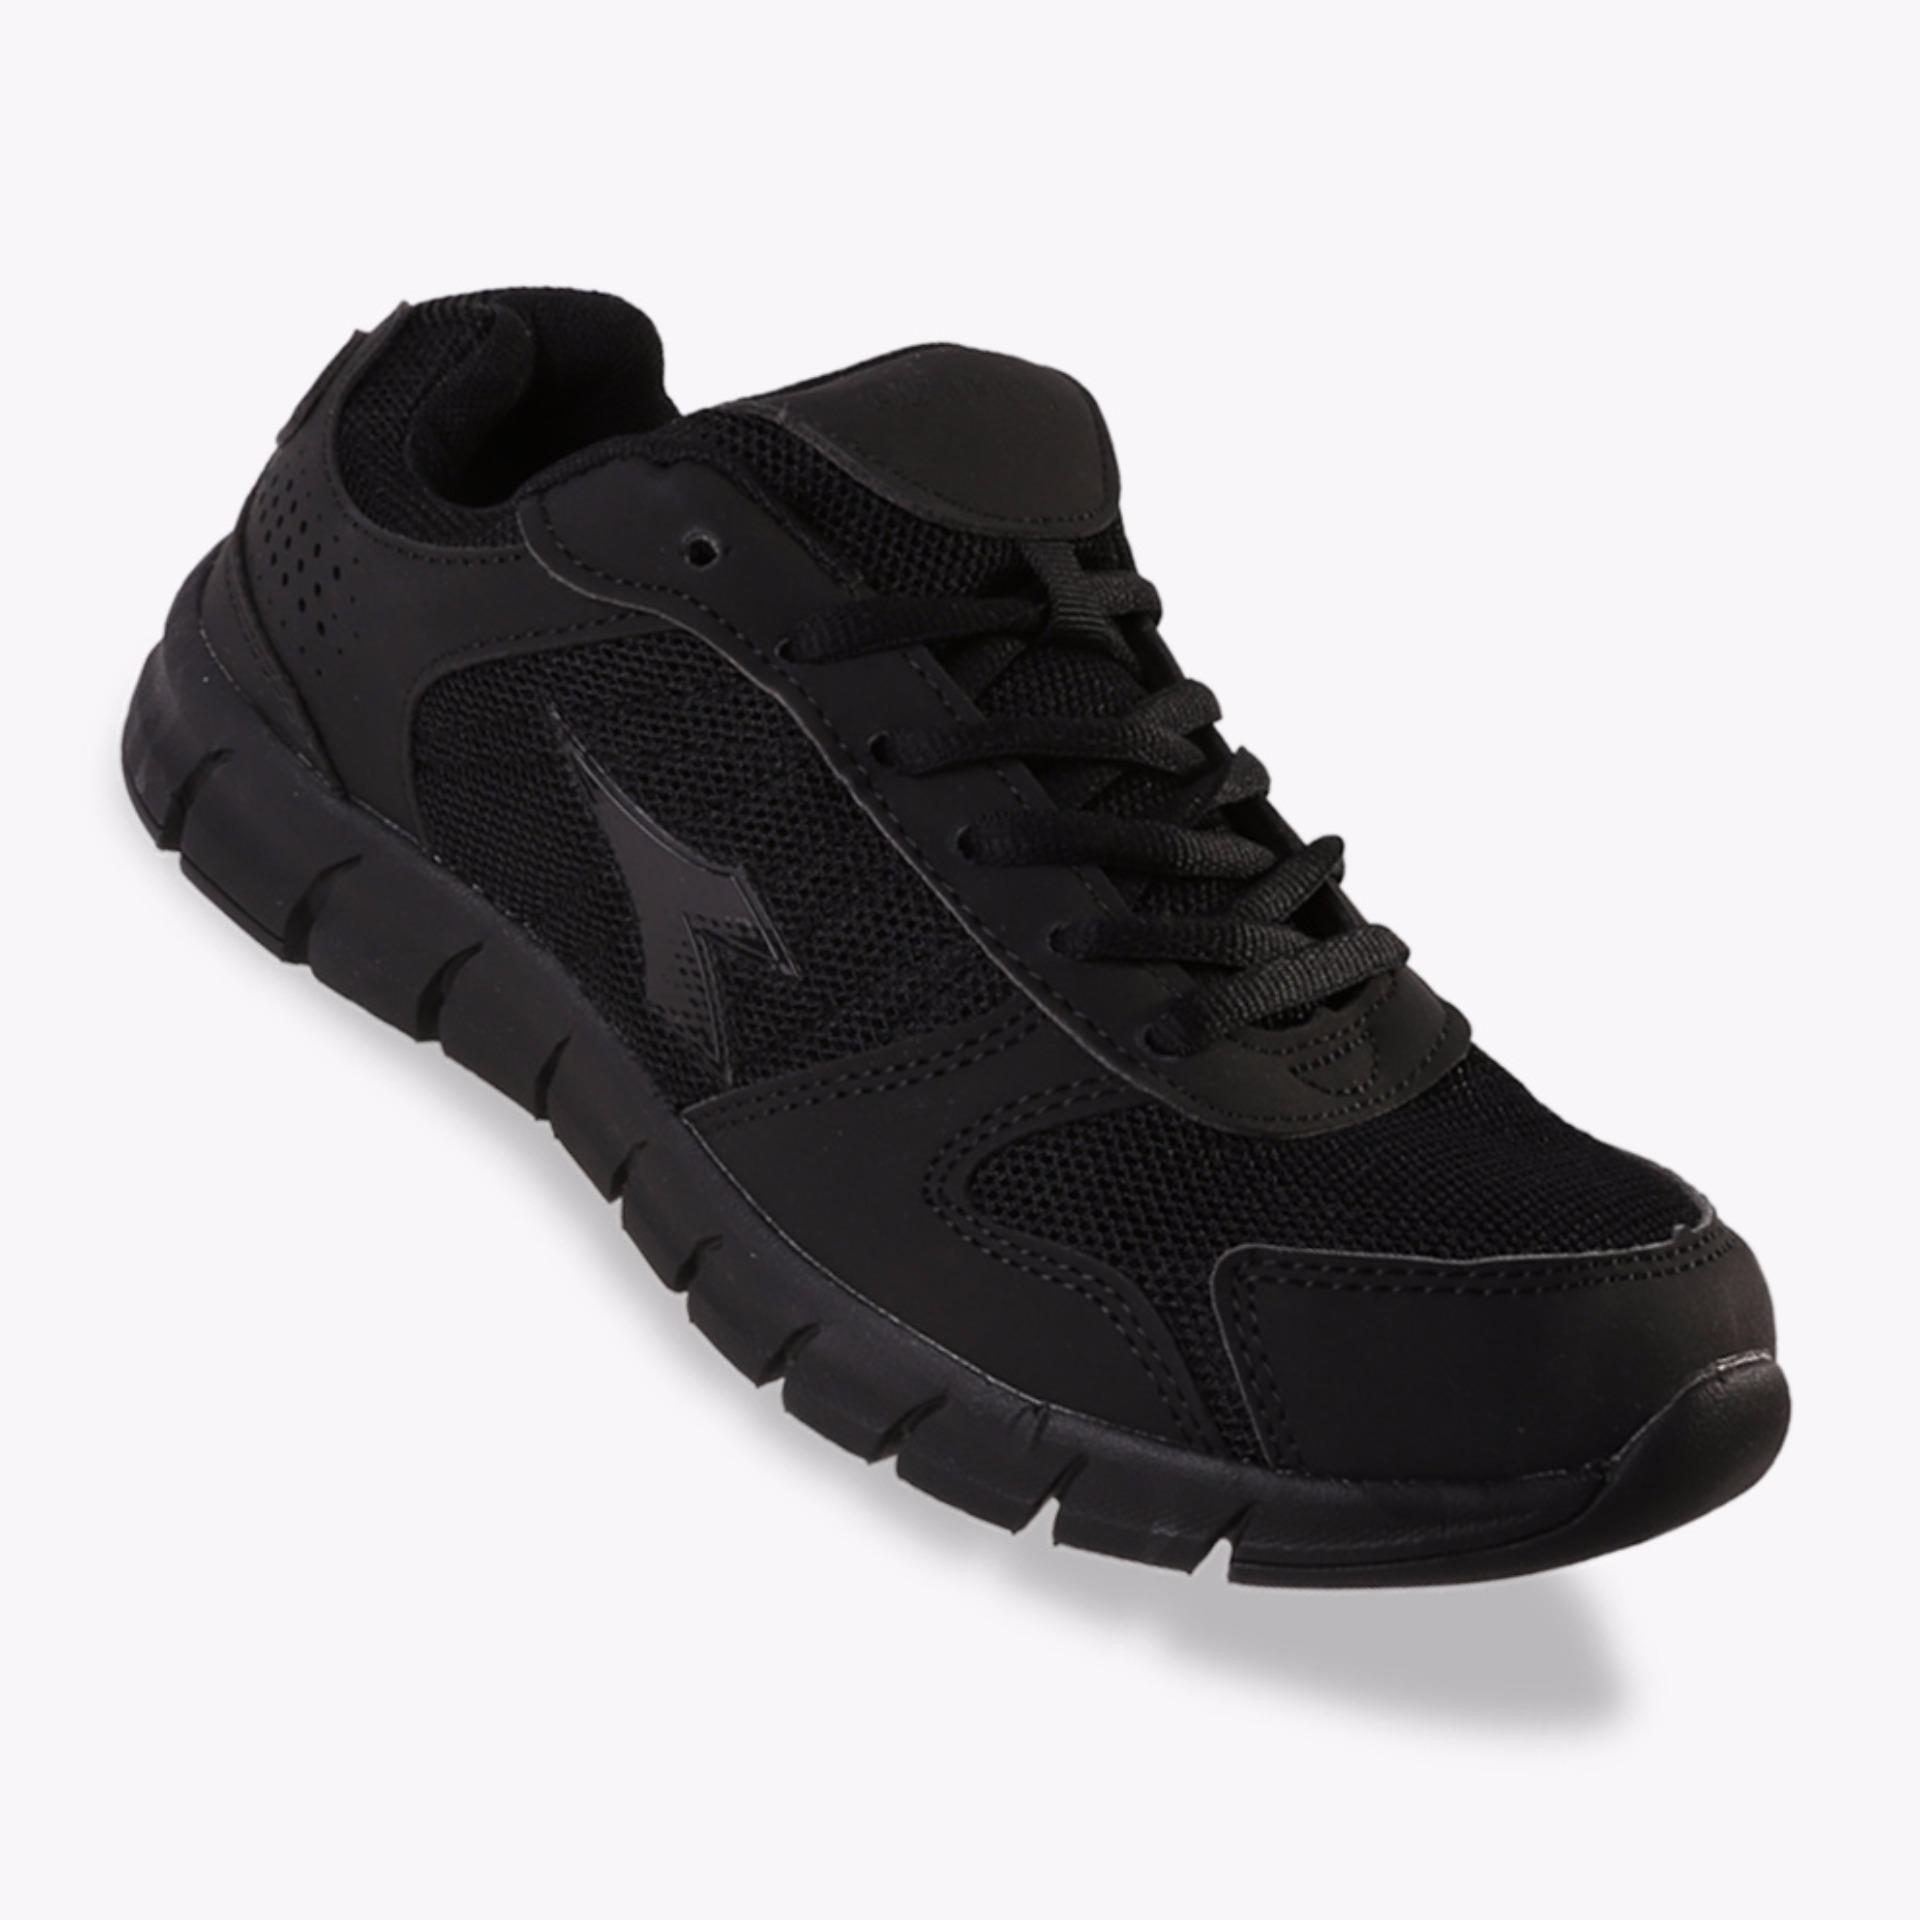 Harga Diadora Eno Kids Sch**l Shoes Hitam Paling Murah